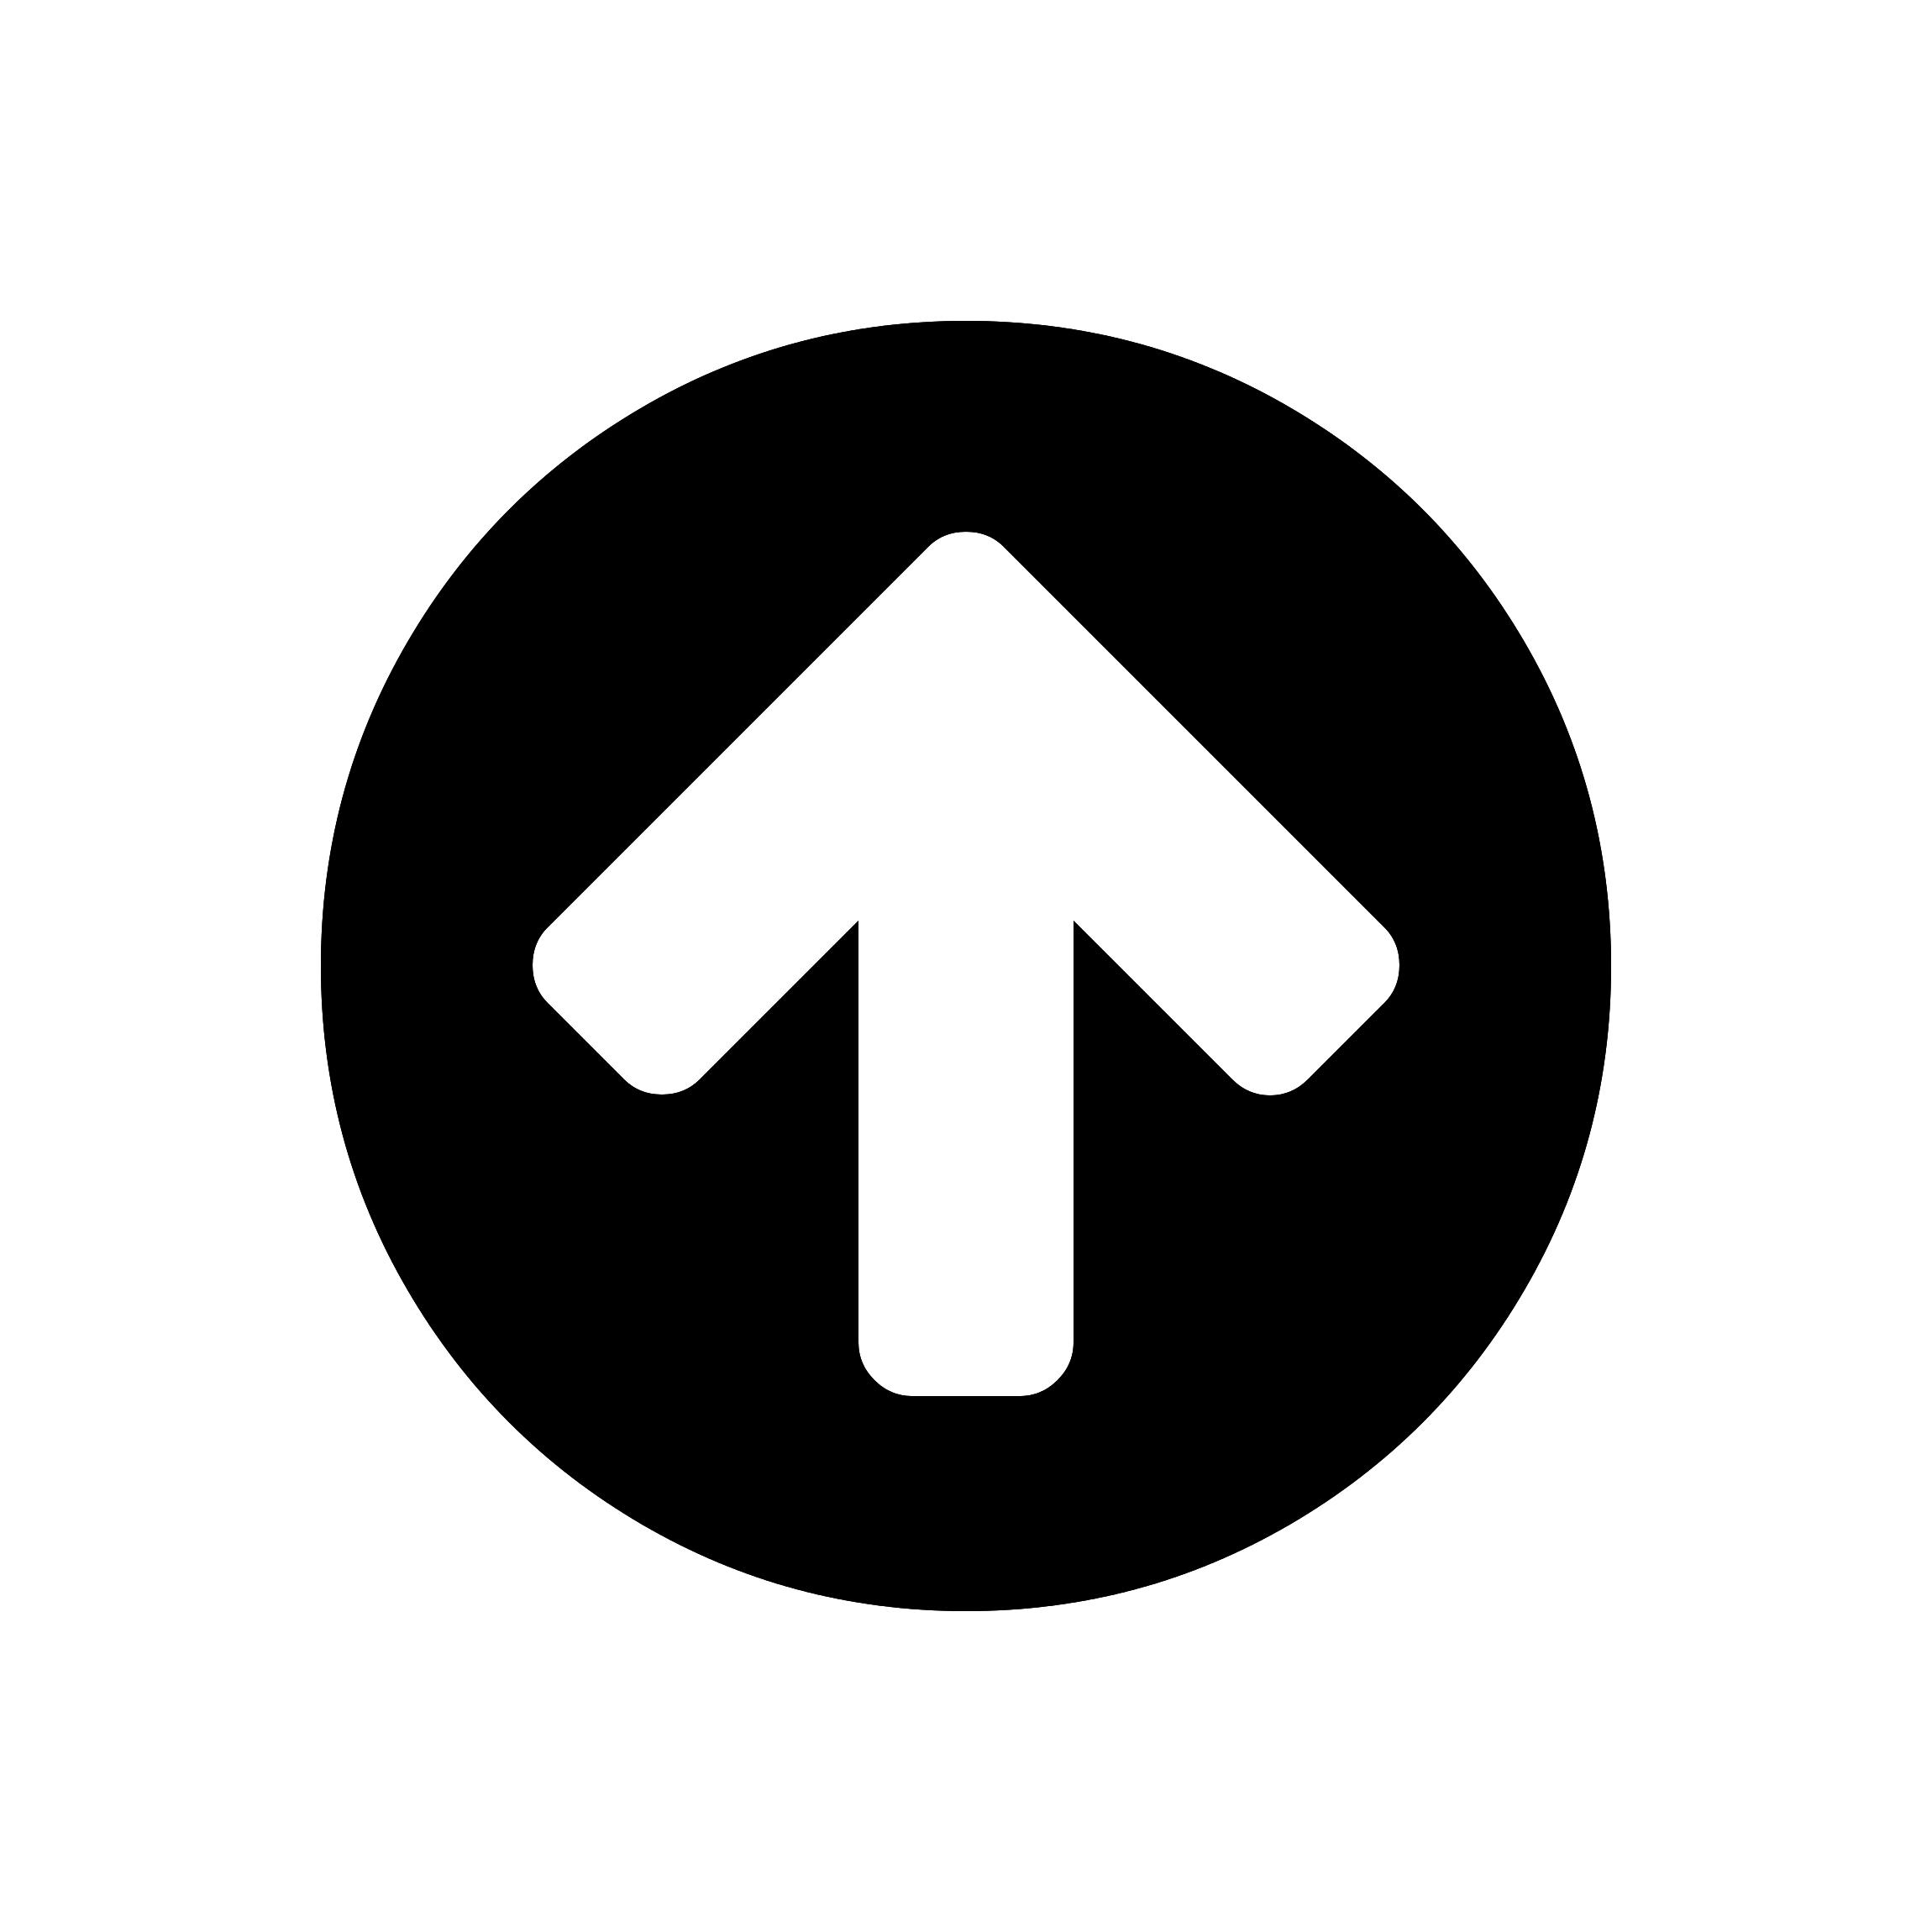 data/images/arrow-circle-up.png